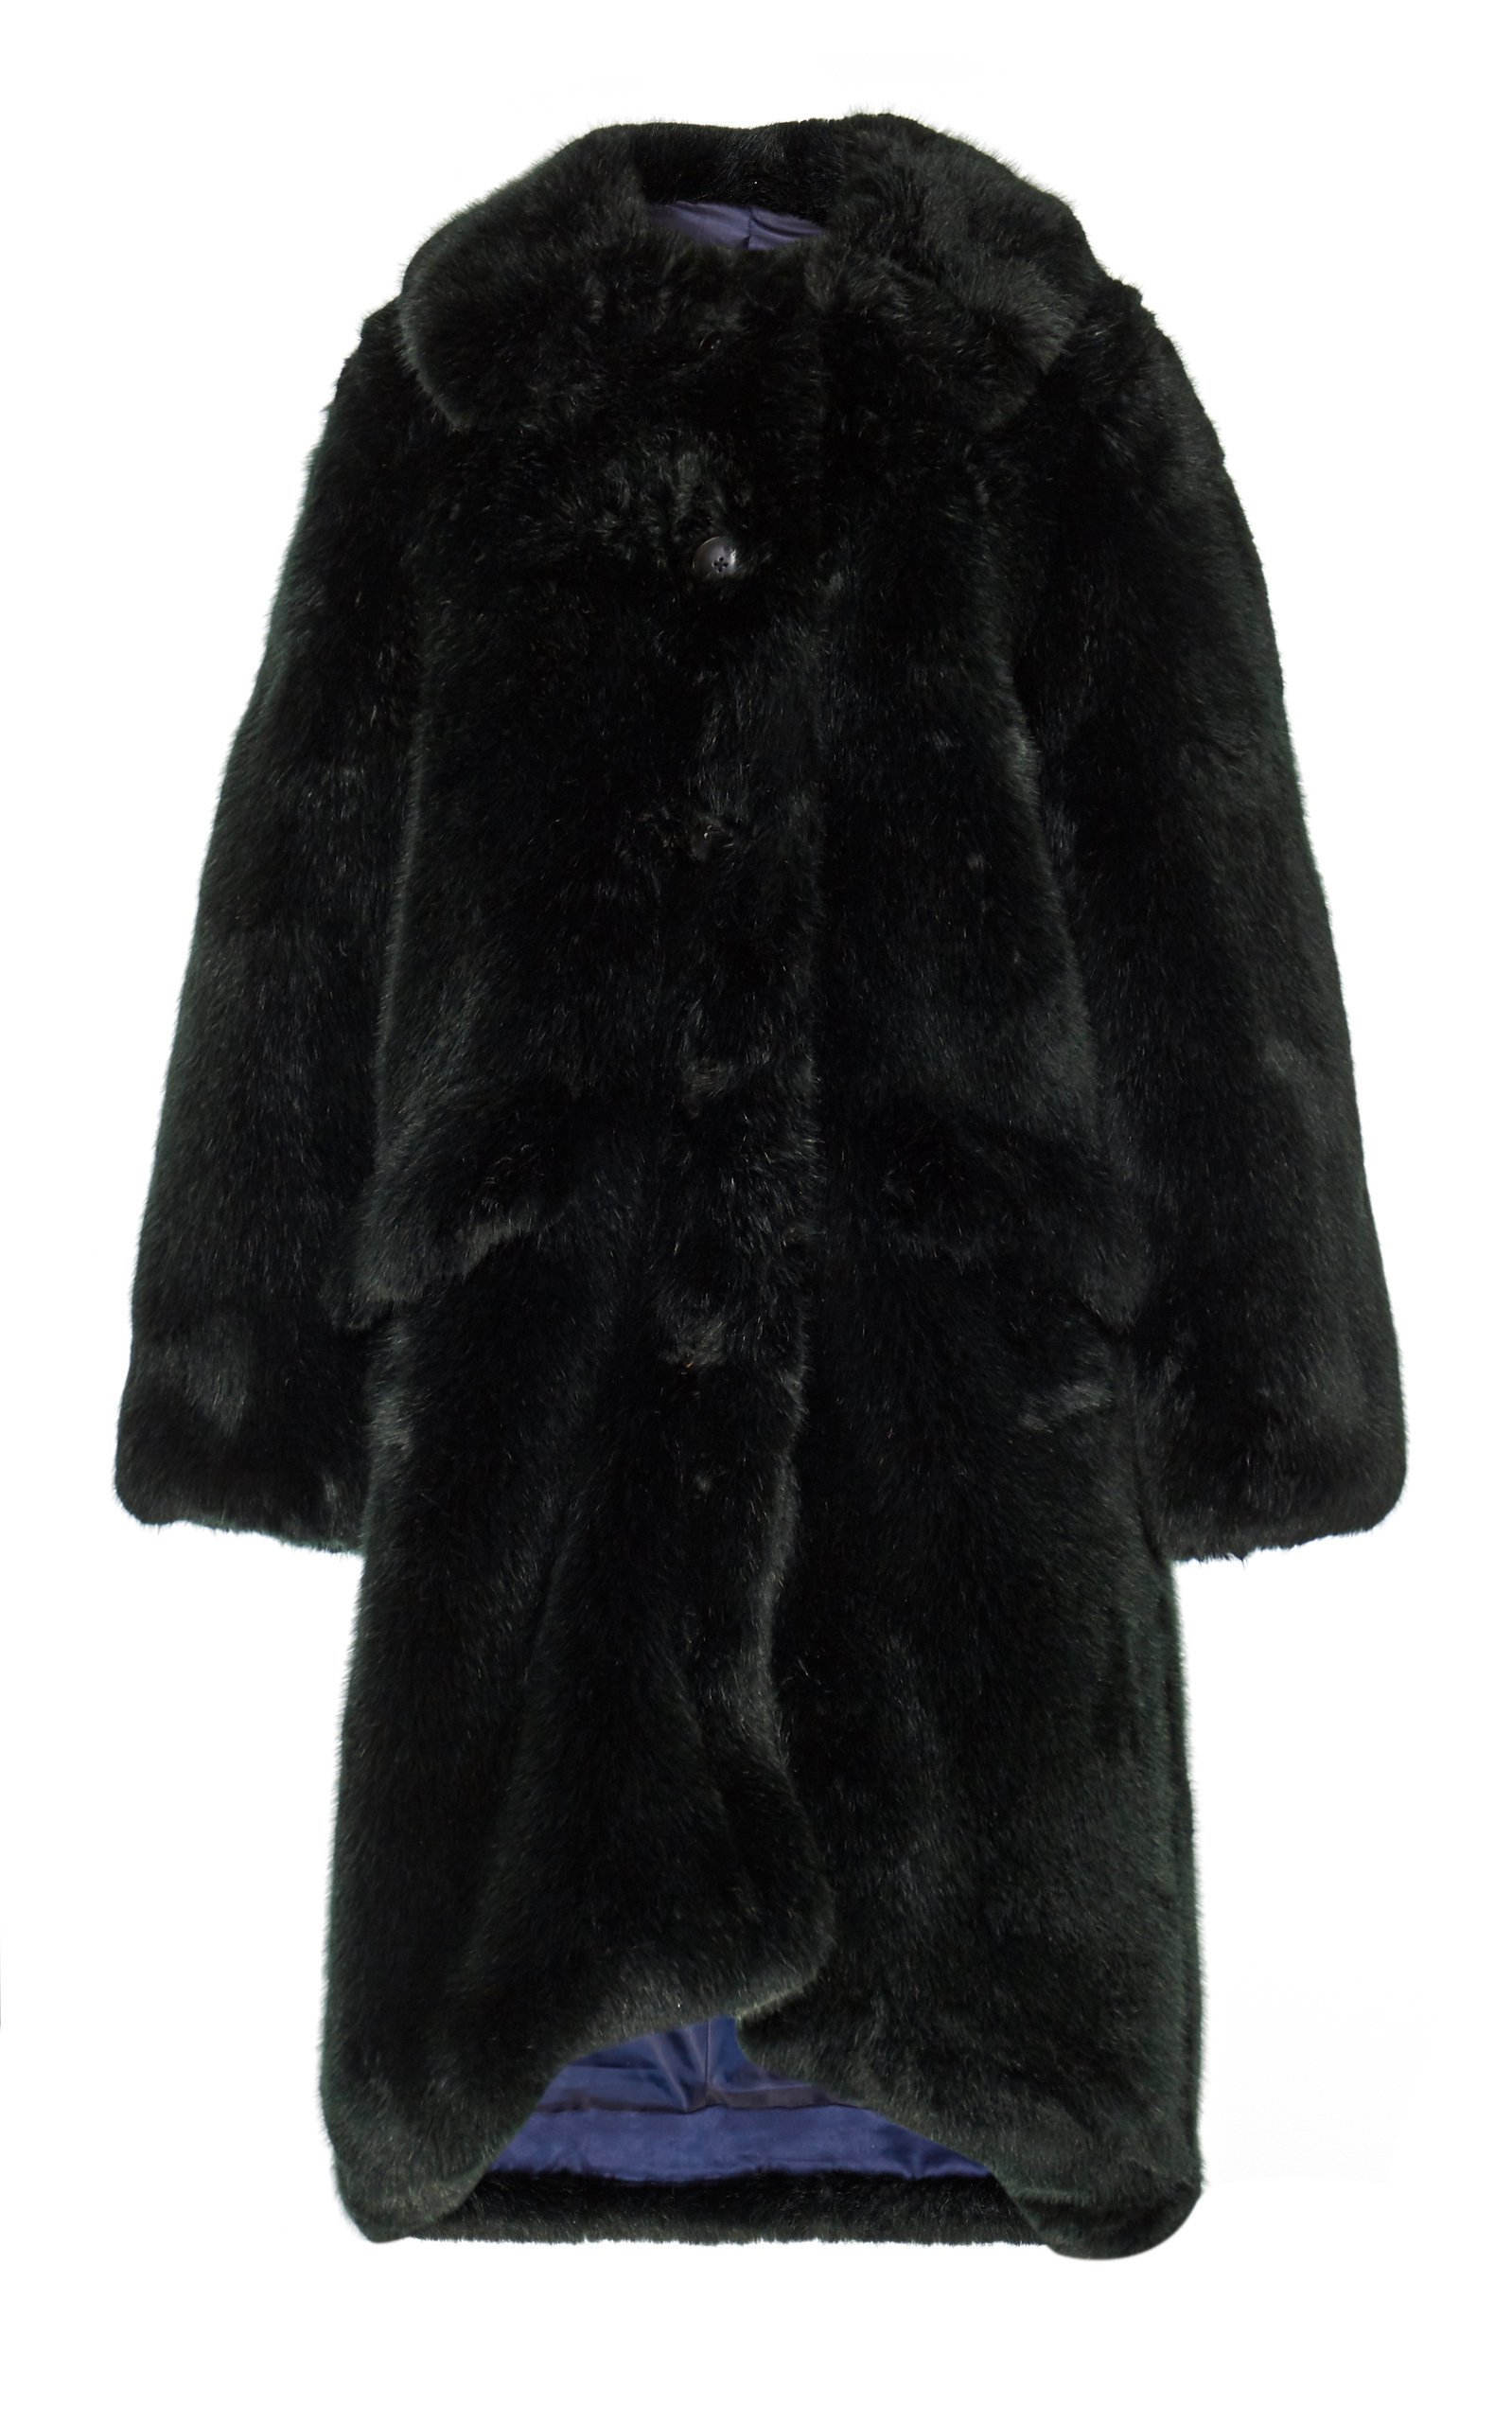 Tory Burch Faux Fur Coat